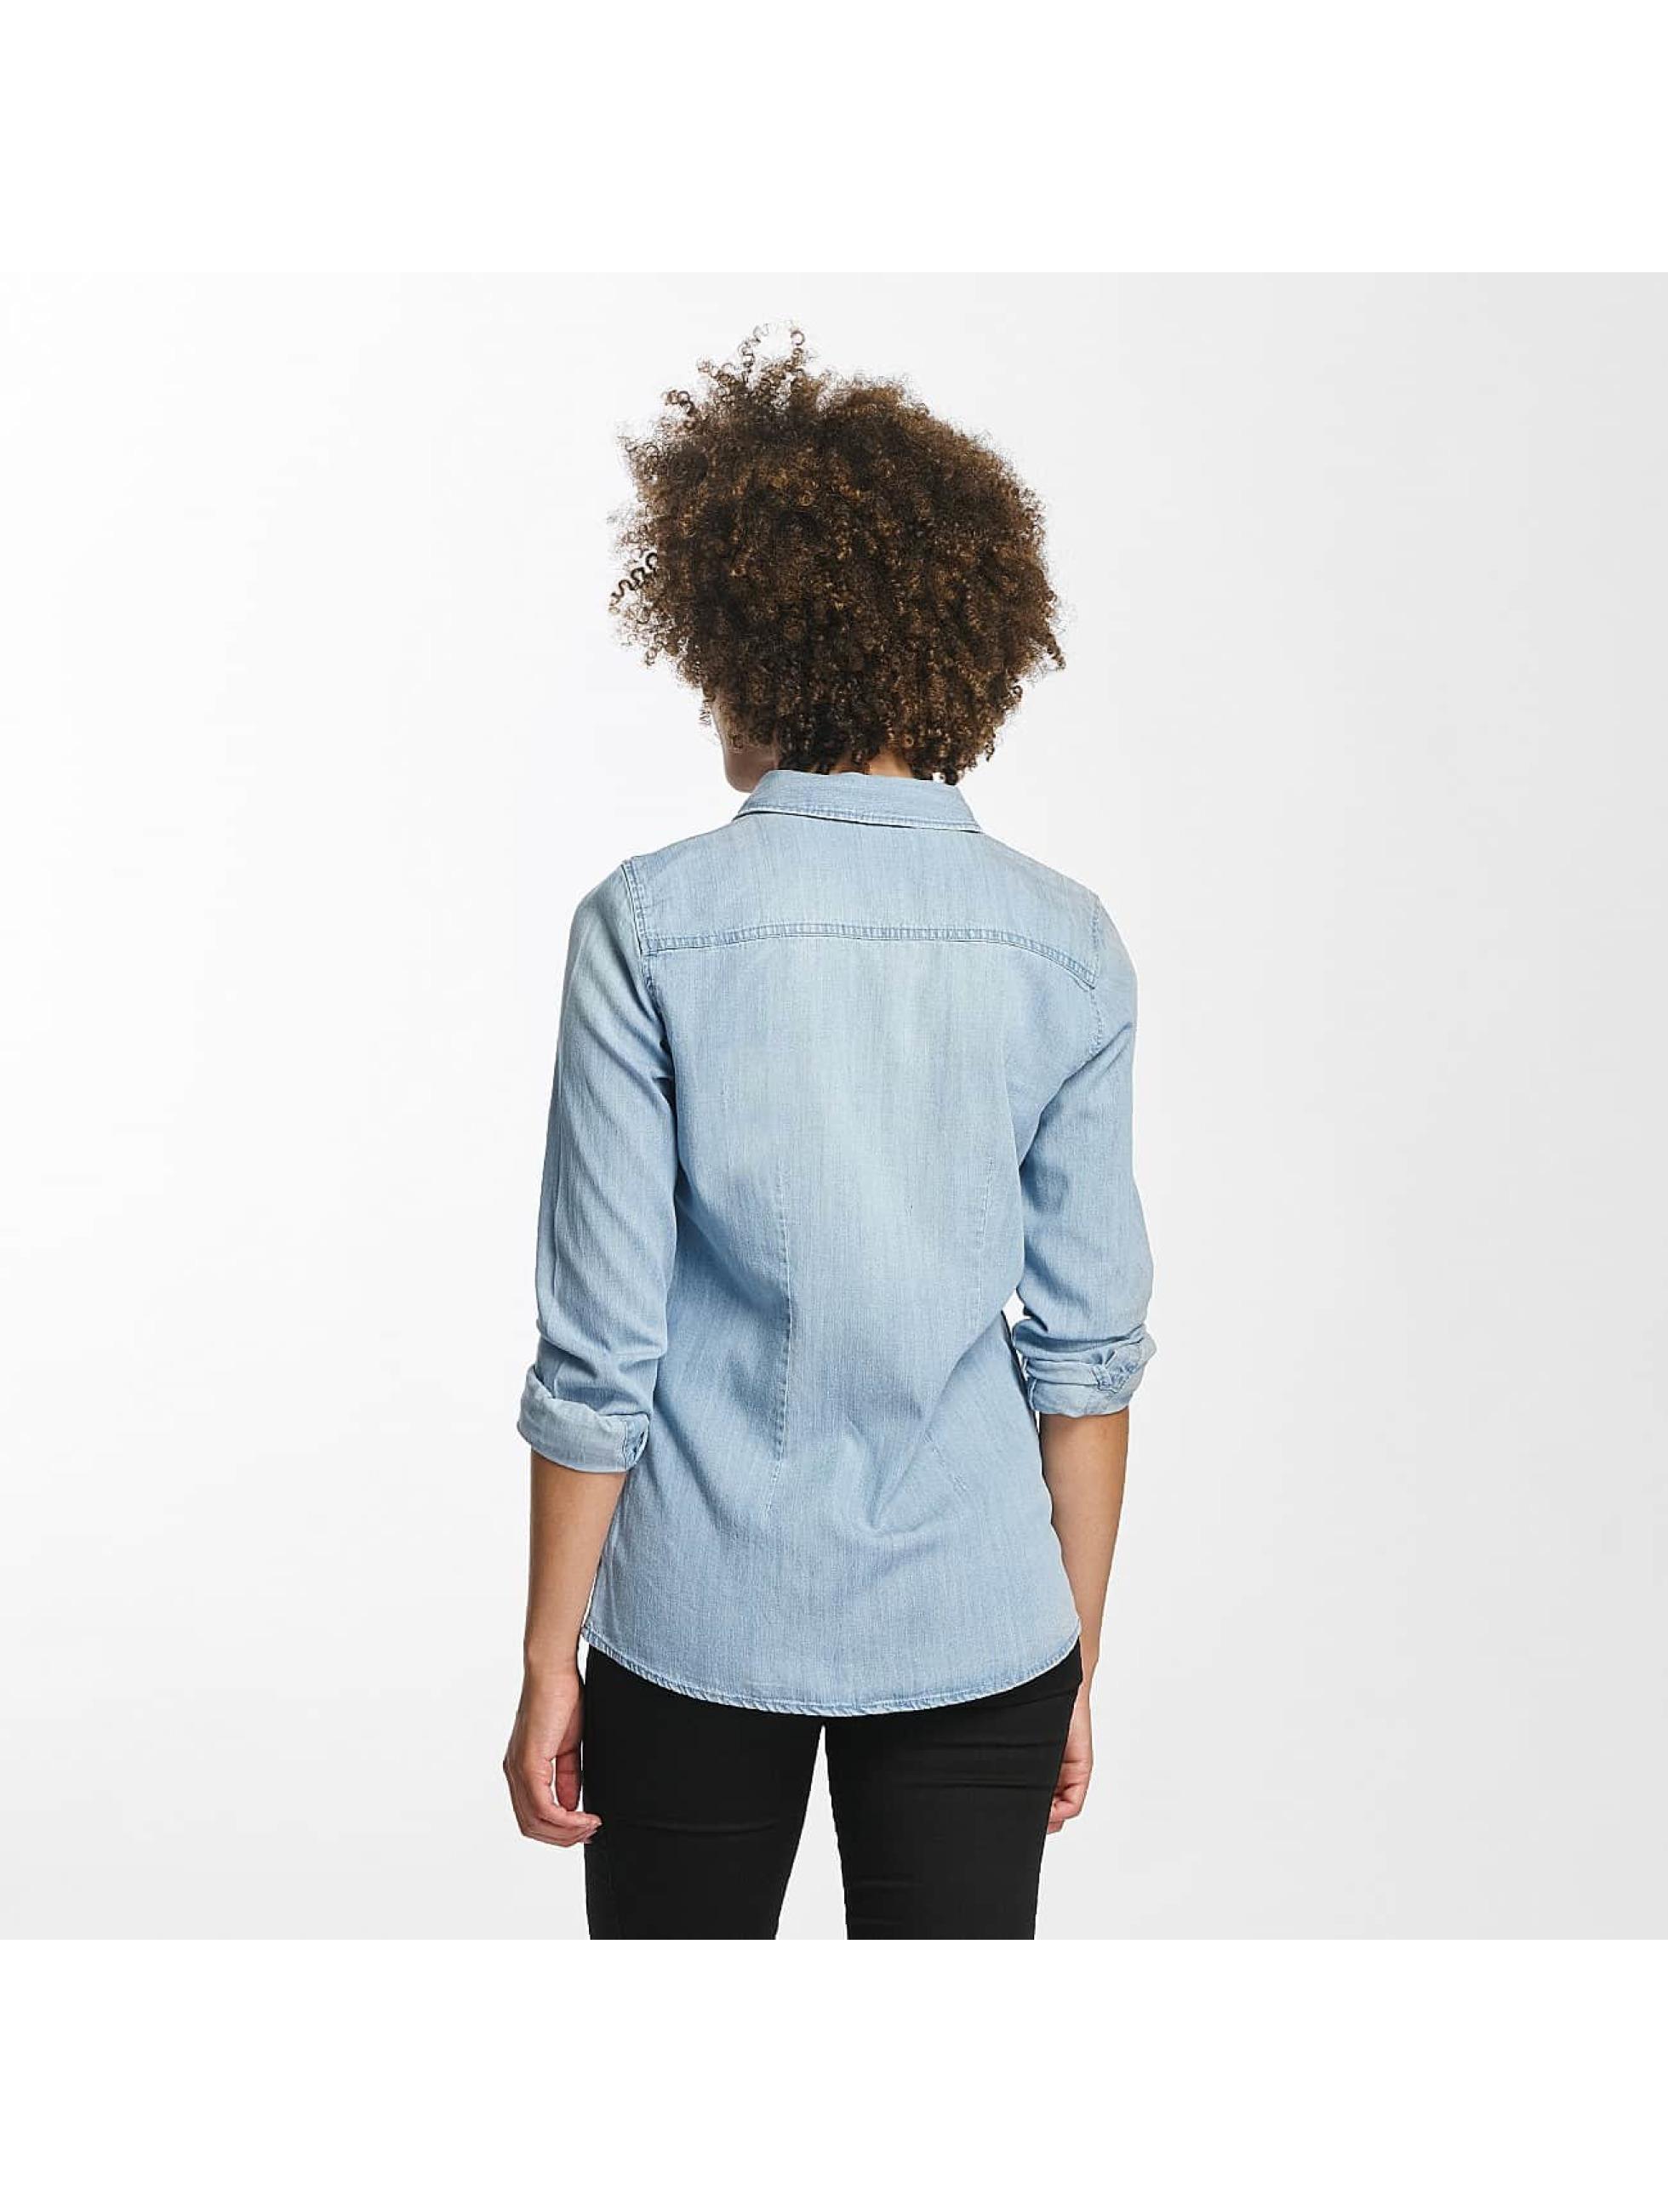 Vero Moda Bluzka/Tuniki vmViola Embroidery niebieski